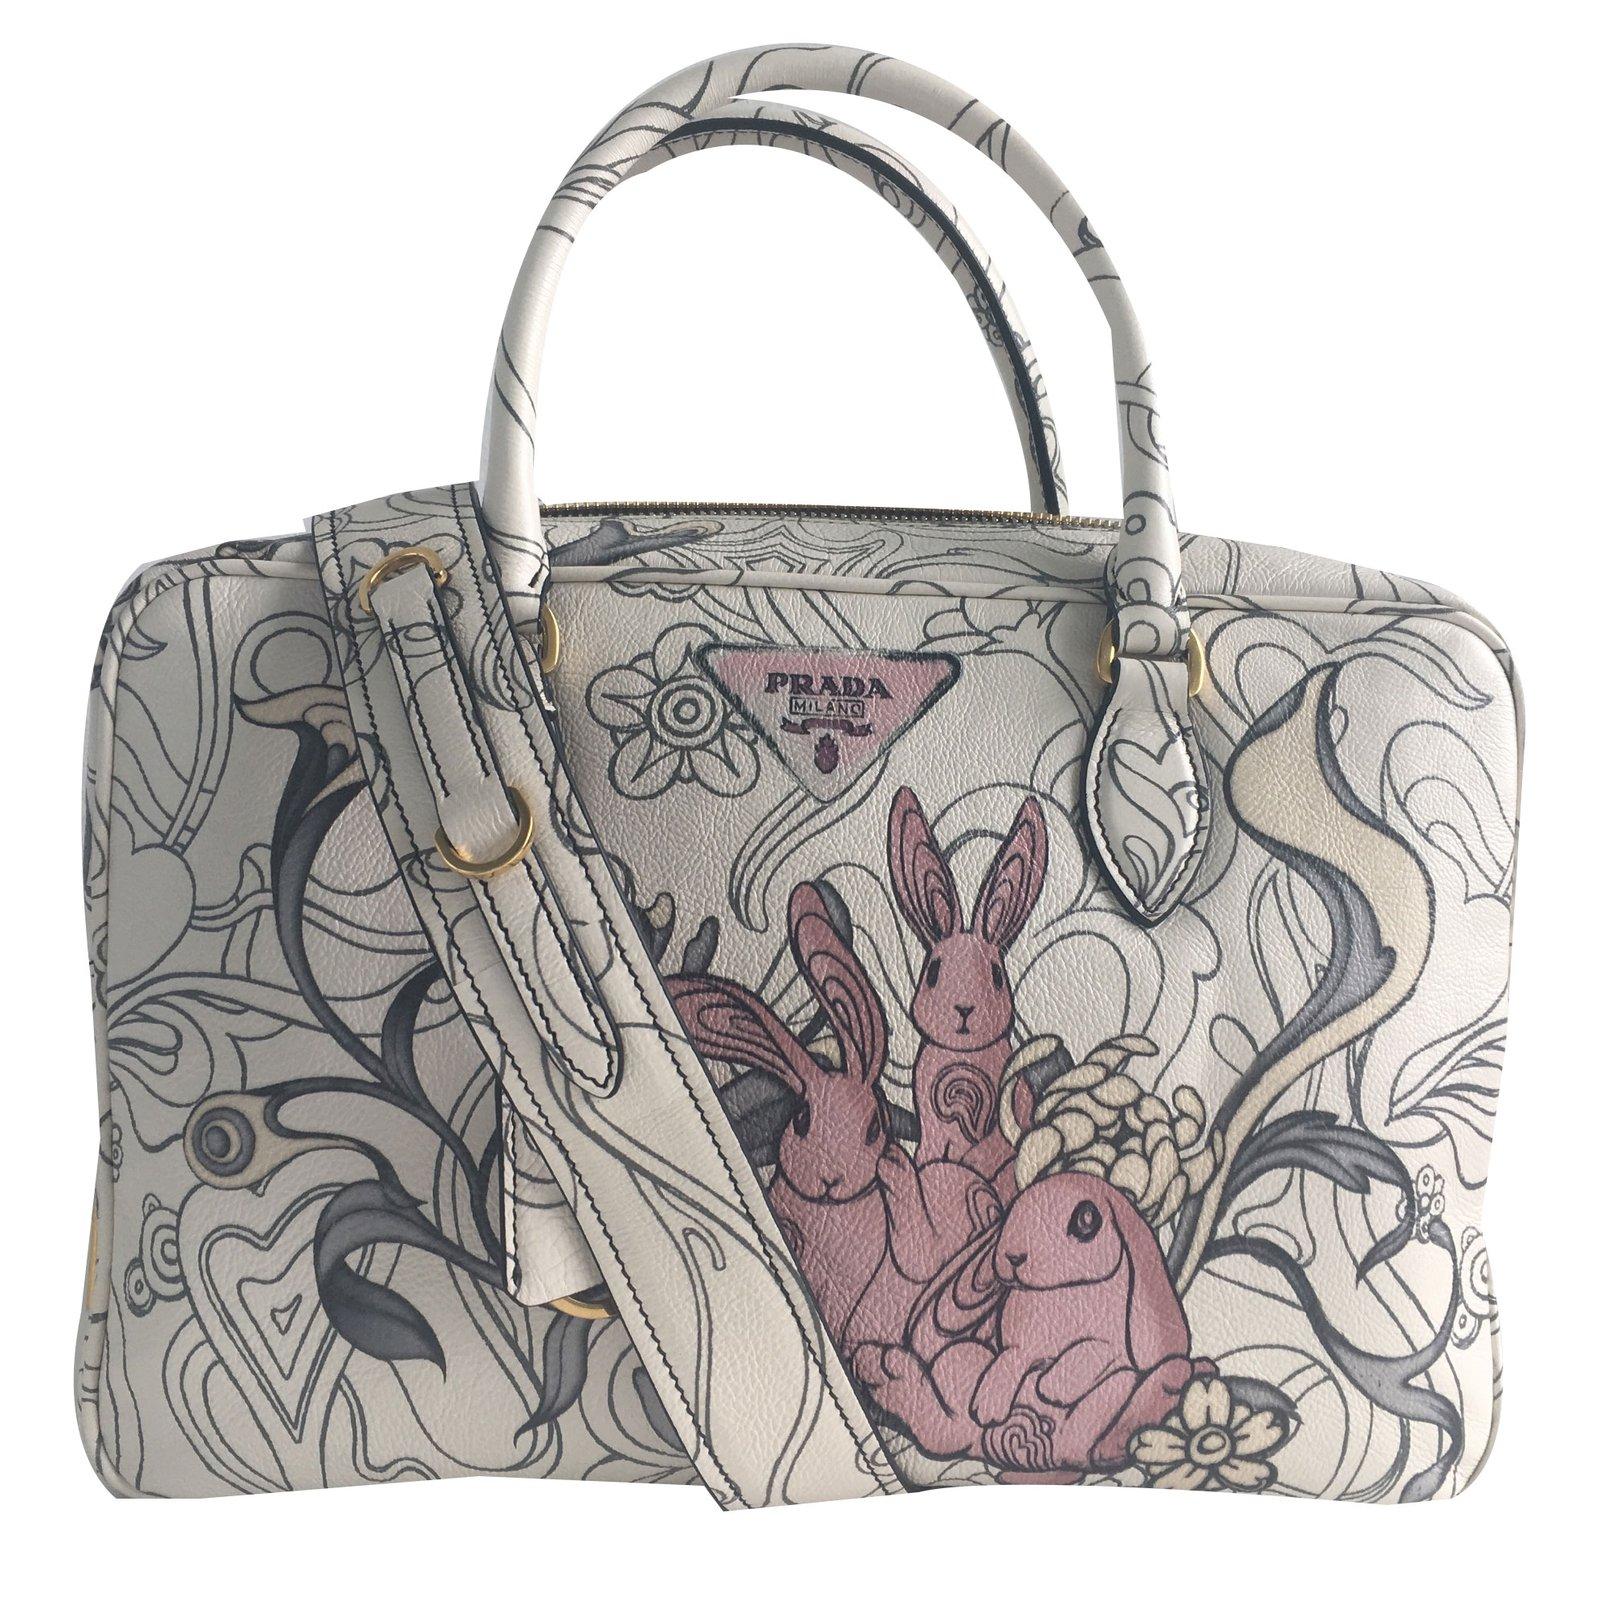 6871bc2d5045 Prada Rabbit bag ressort 2018 Collection Handbags Leather Ebony ref.76187